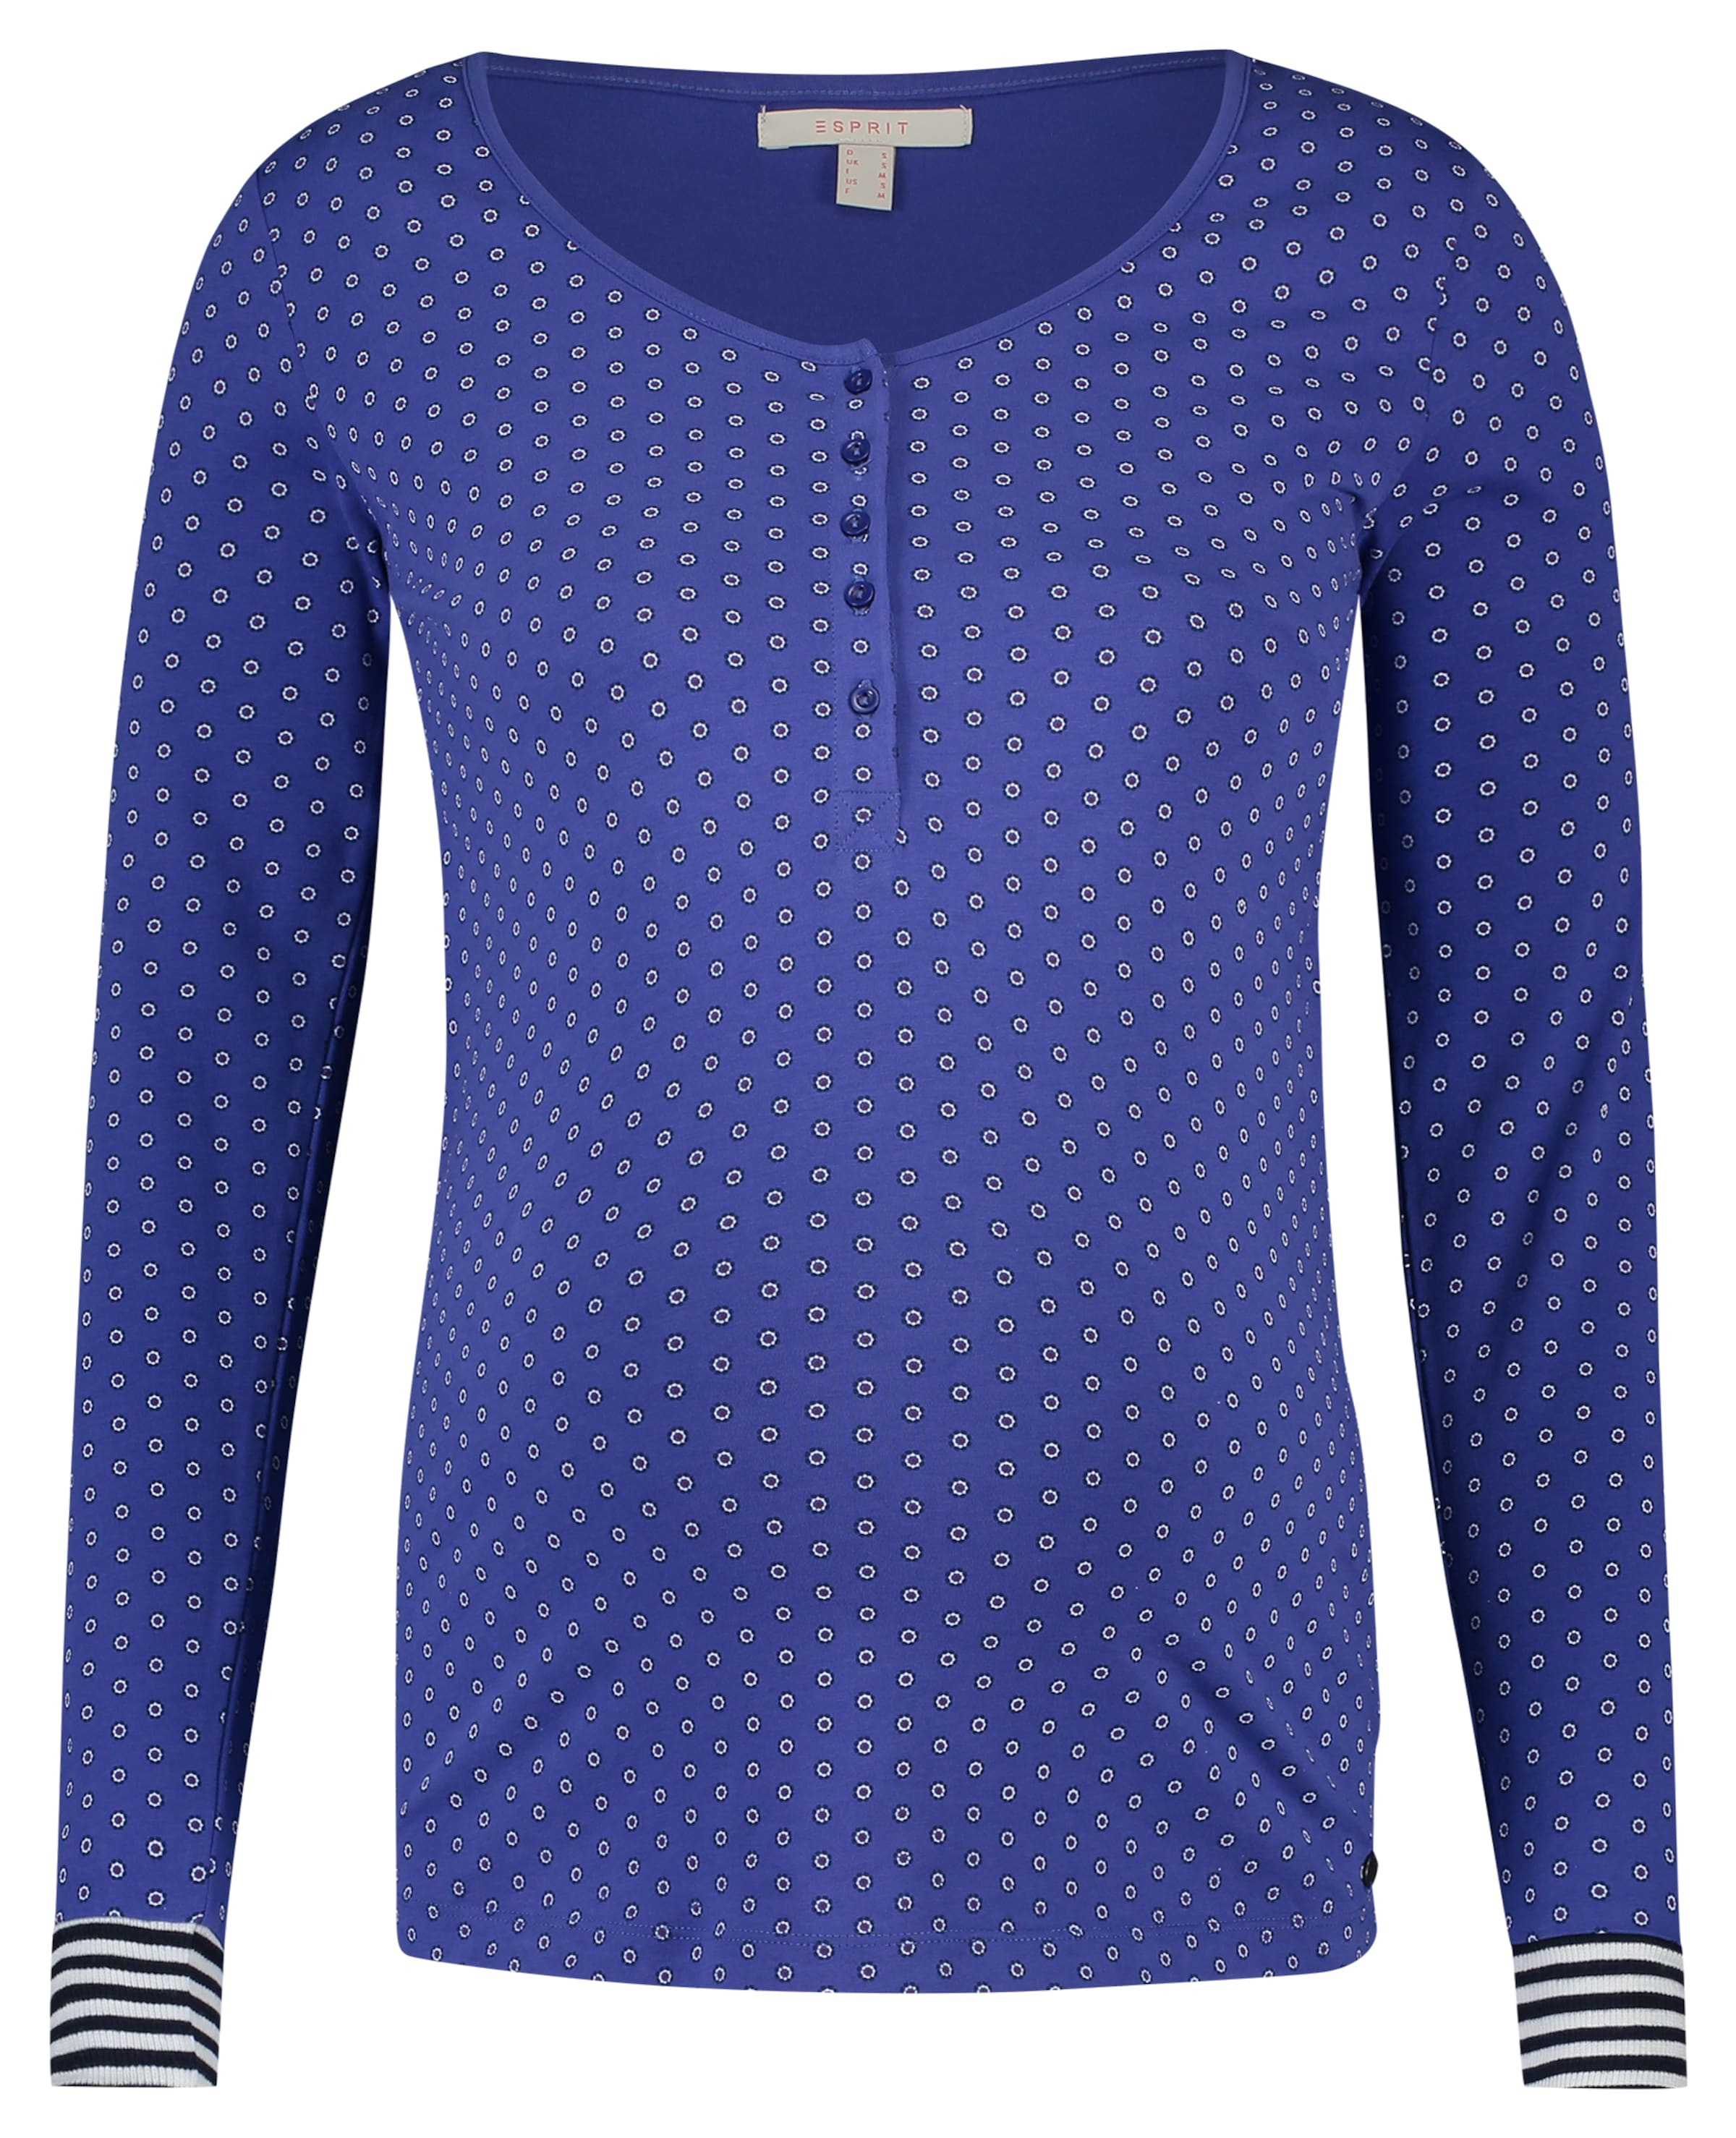 Shirt Weiß Maternity BlauBraun In Esprit QBhdCxtsr